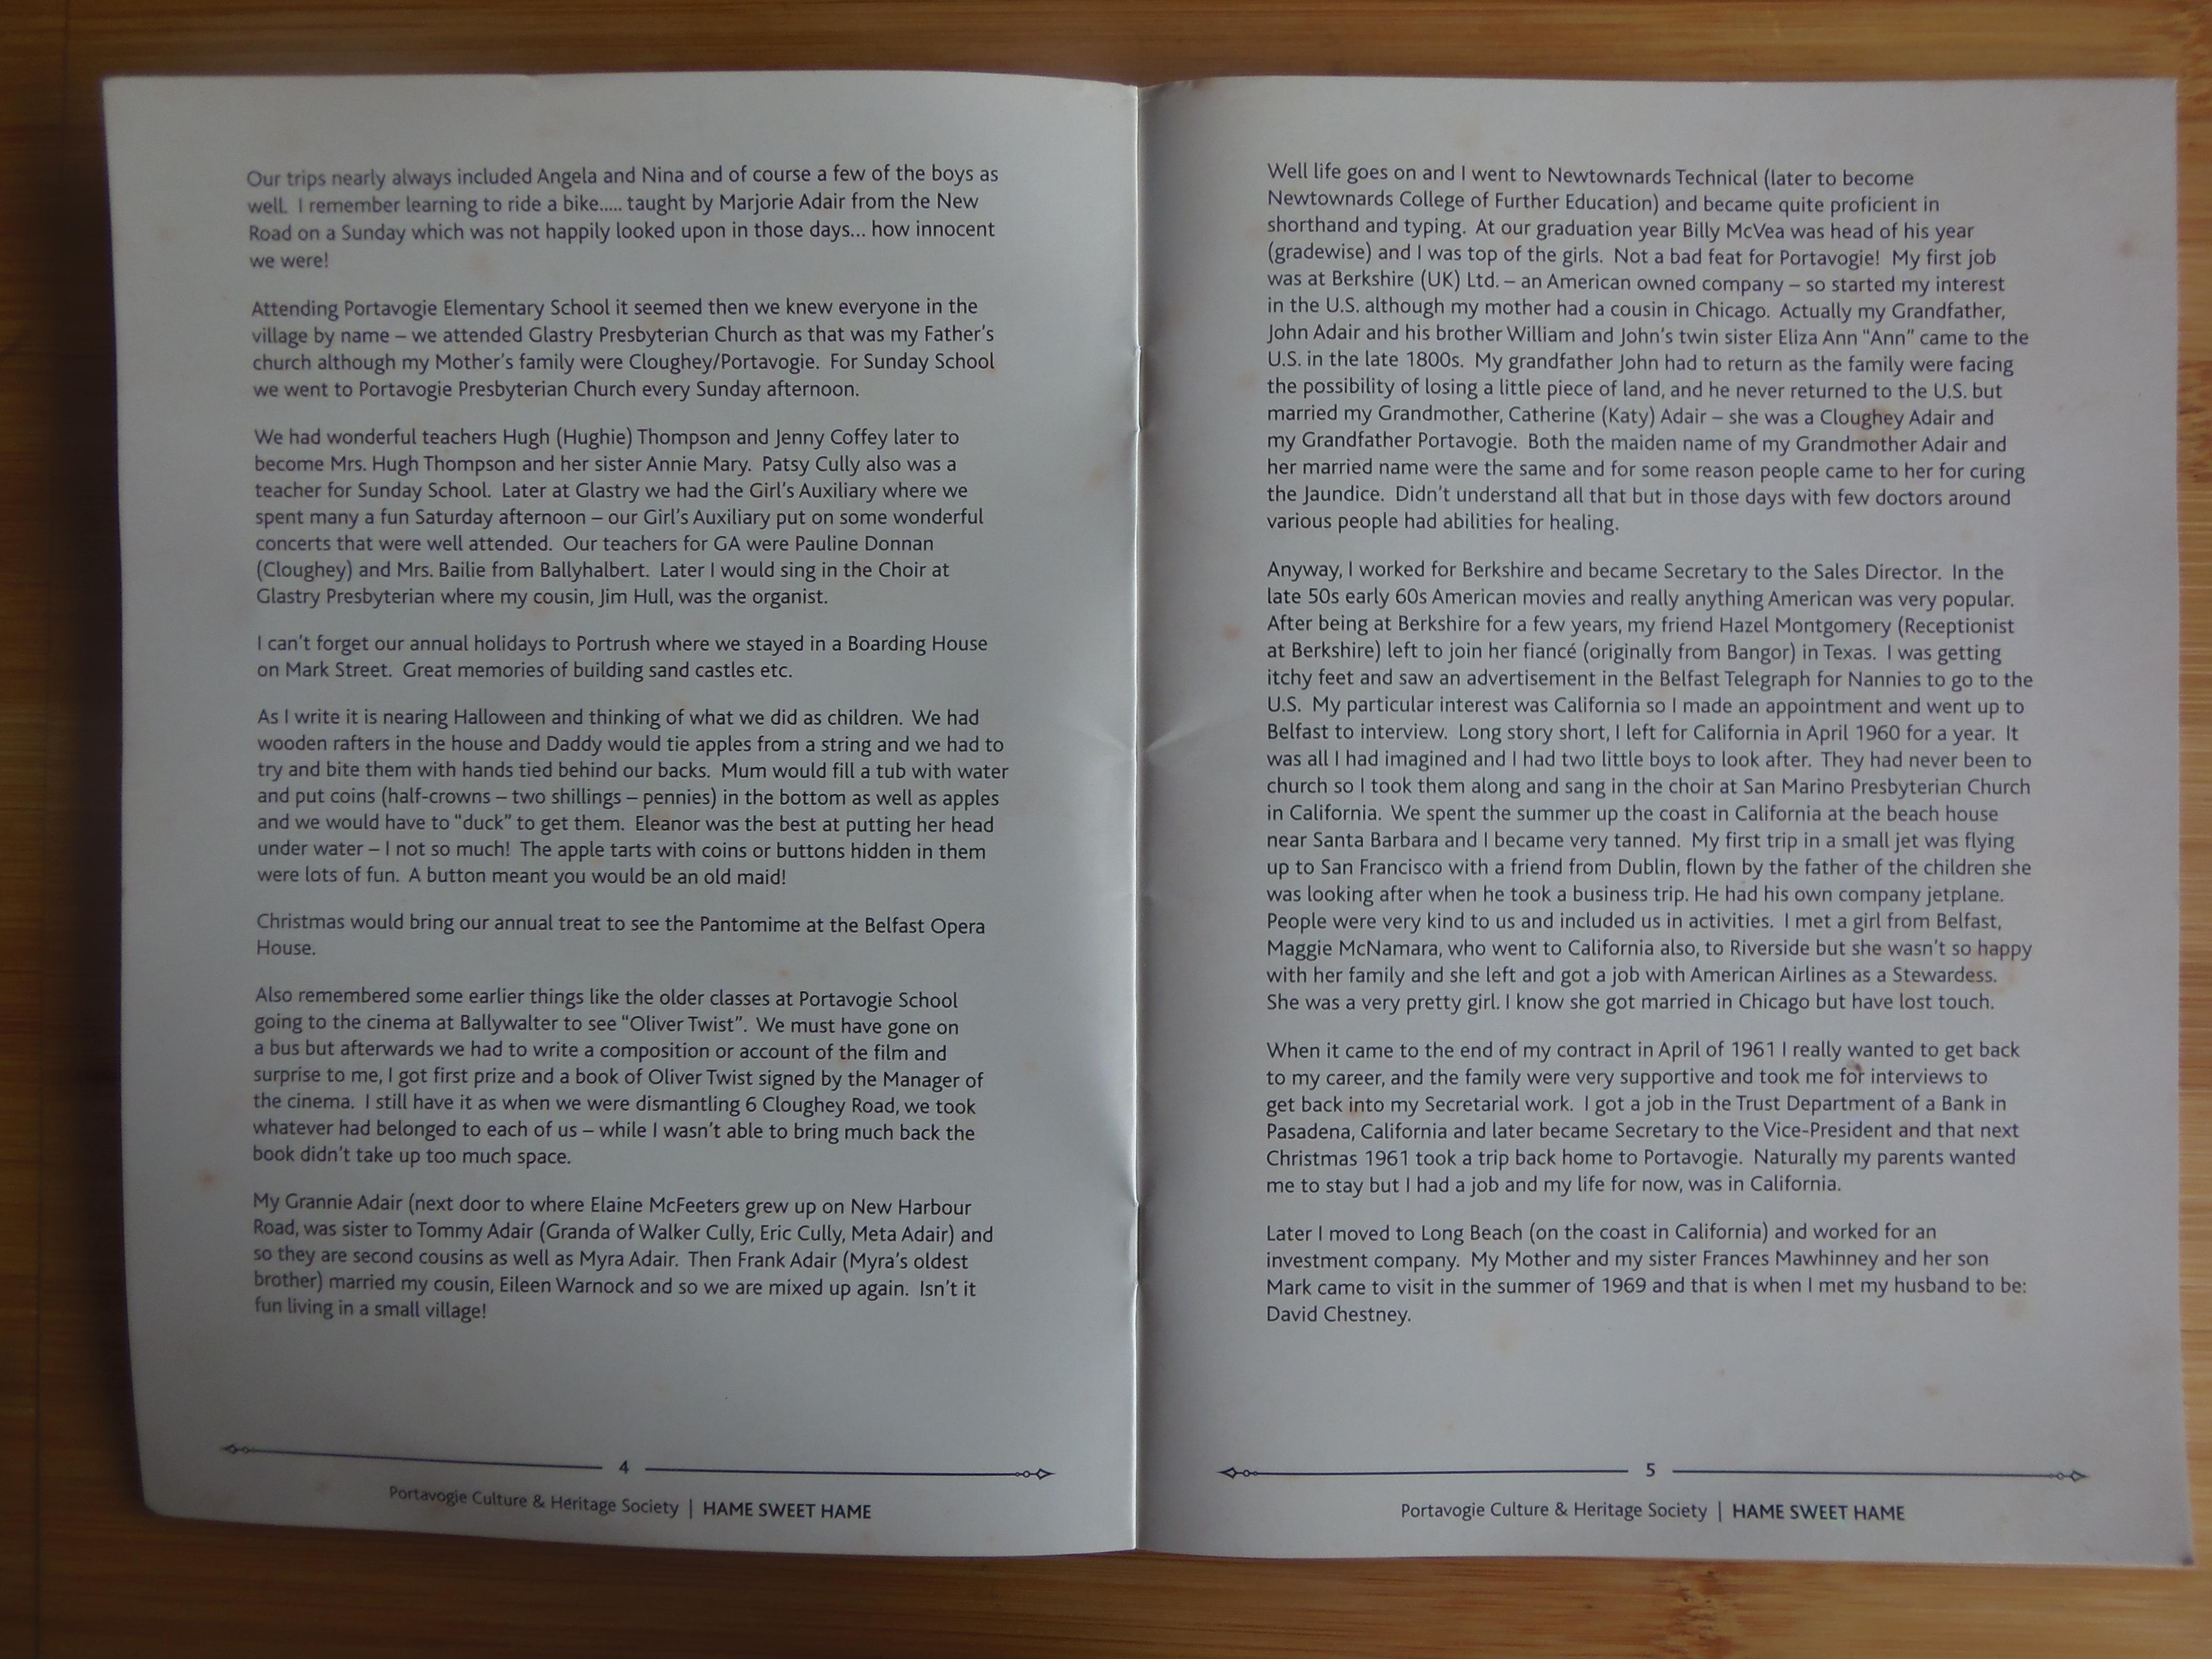 pg 4-5